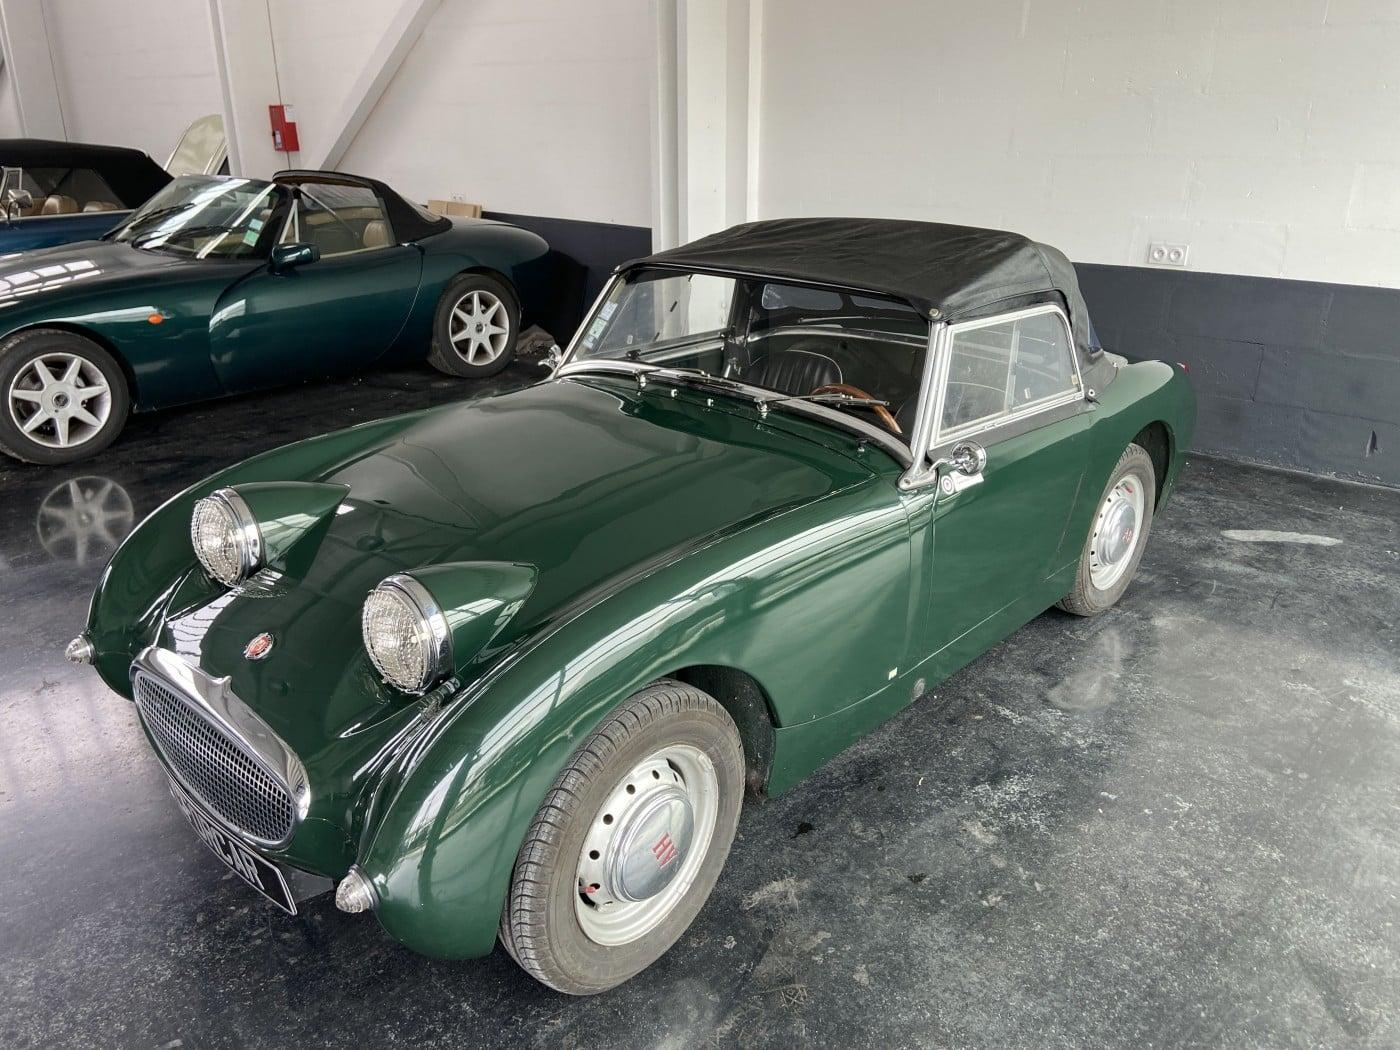 voiture-ancienne-cforcar-austin-frogeye-vhc-16